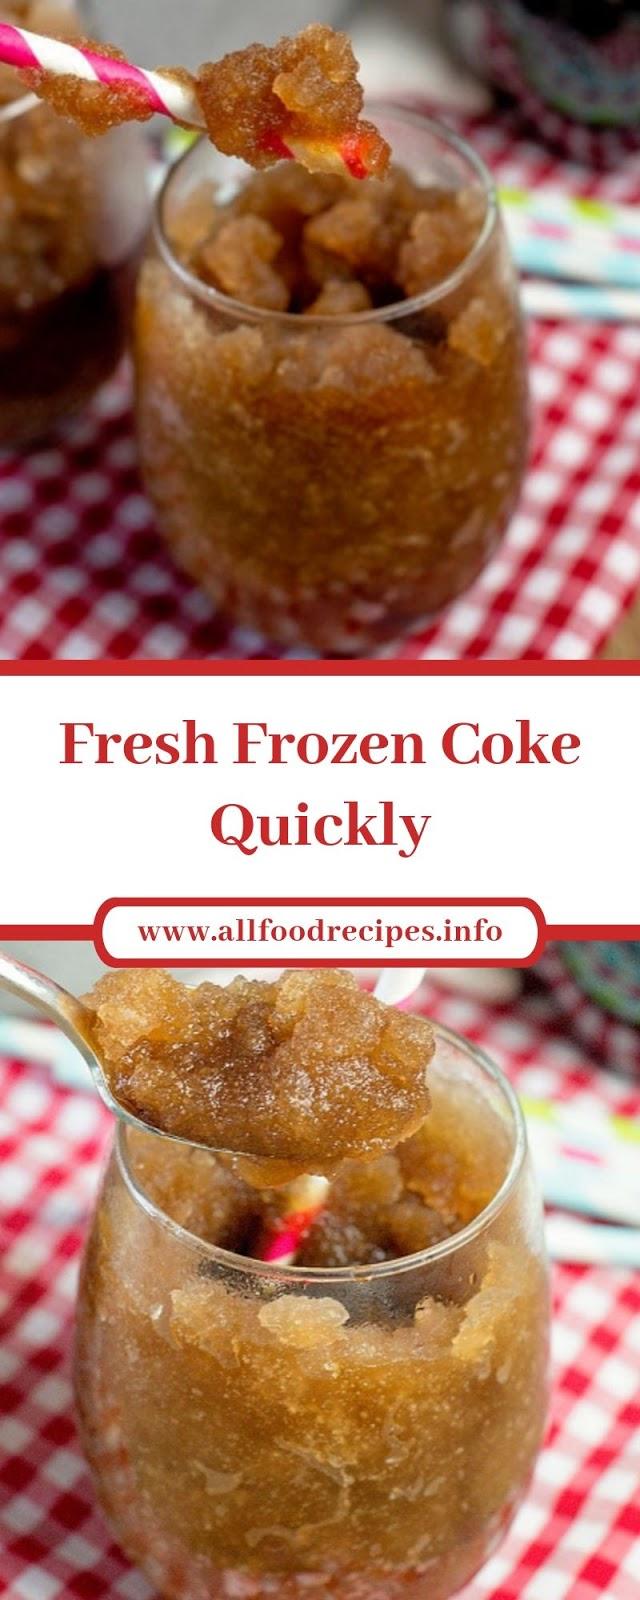 Fresh Frozen Coke Quickly